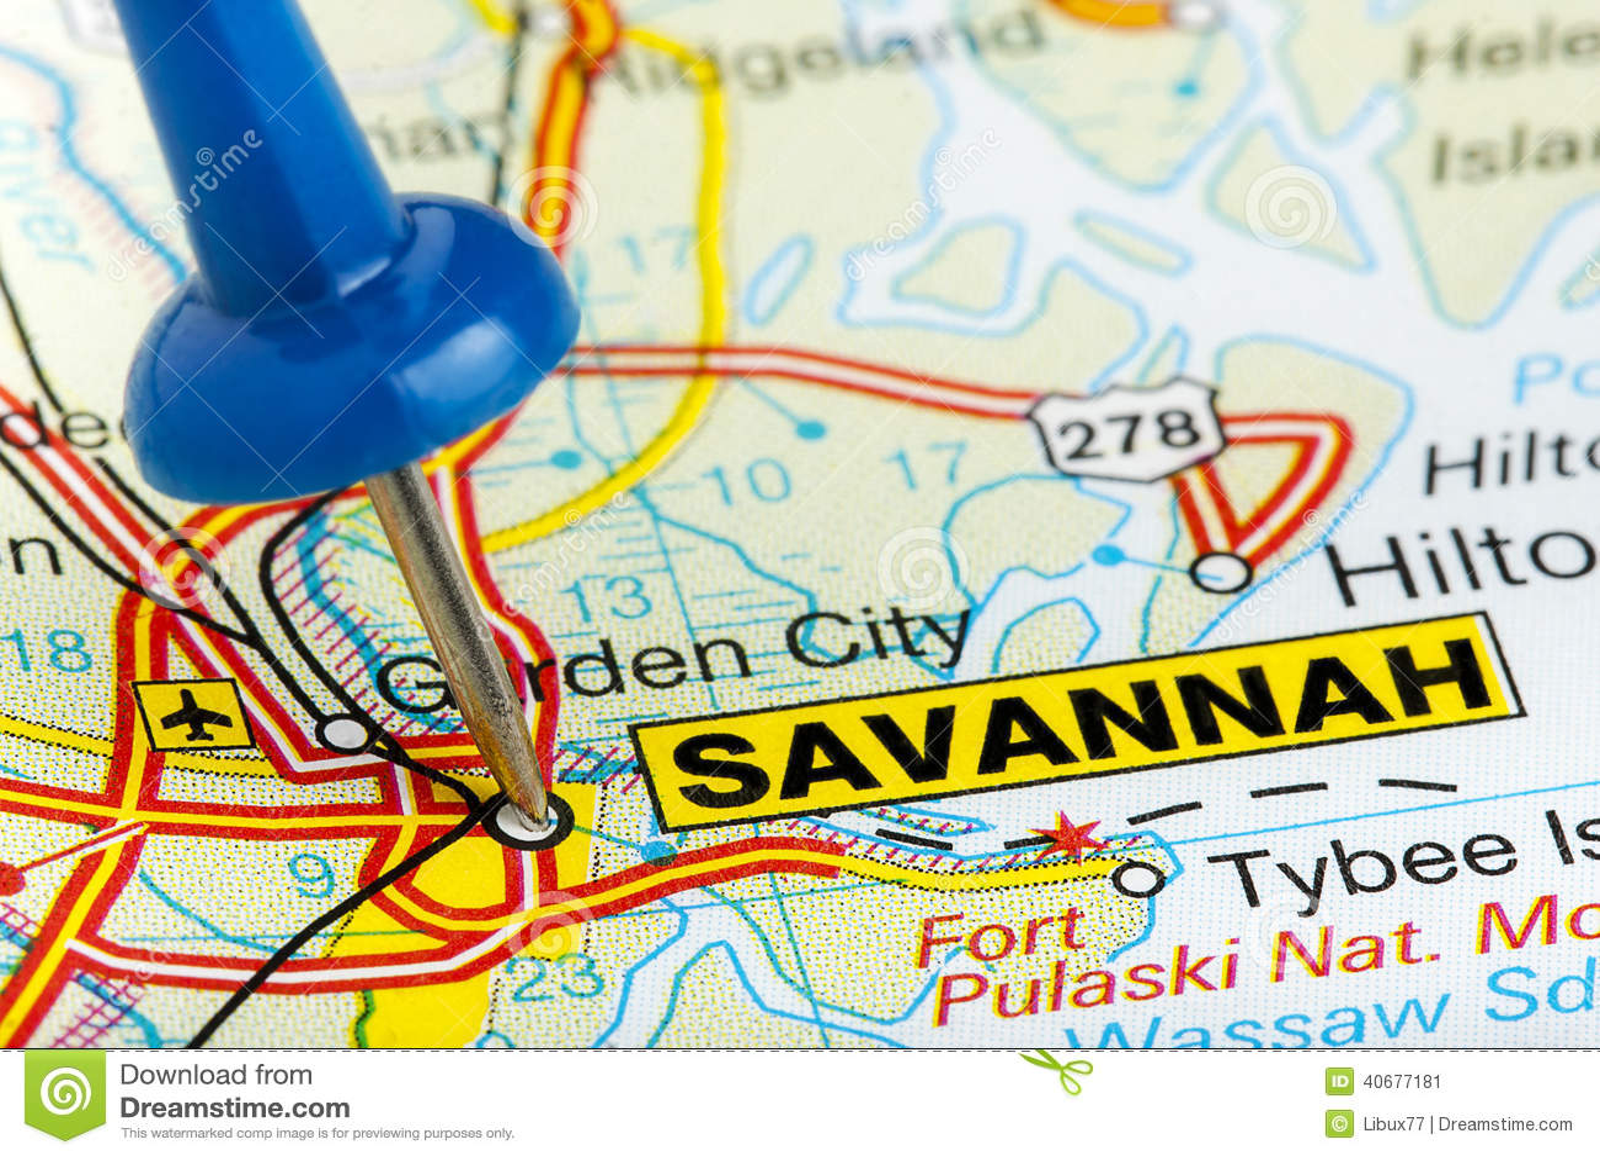 Map Pin In A Map Free Vector Instantshift Beautiful Free: Pushpin Savannah Georgia Map Closeup Stock Image